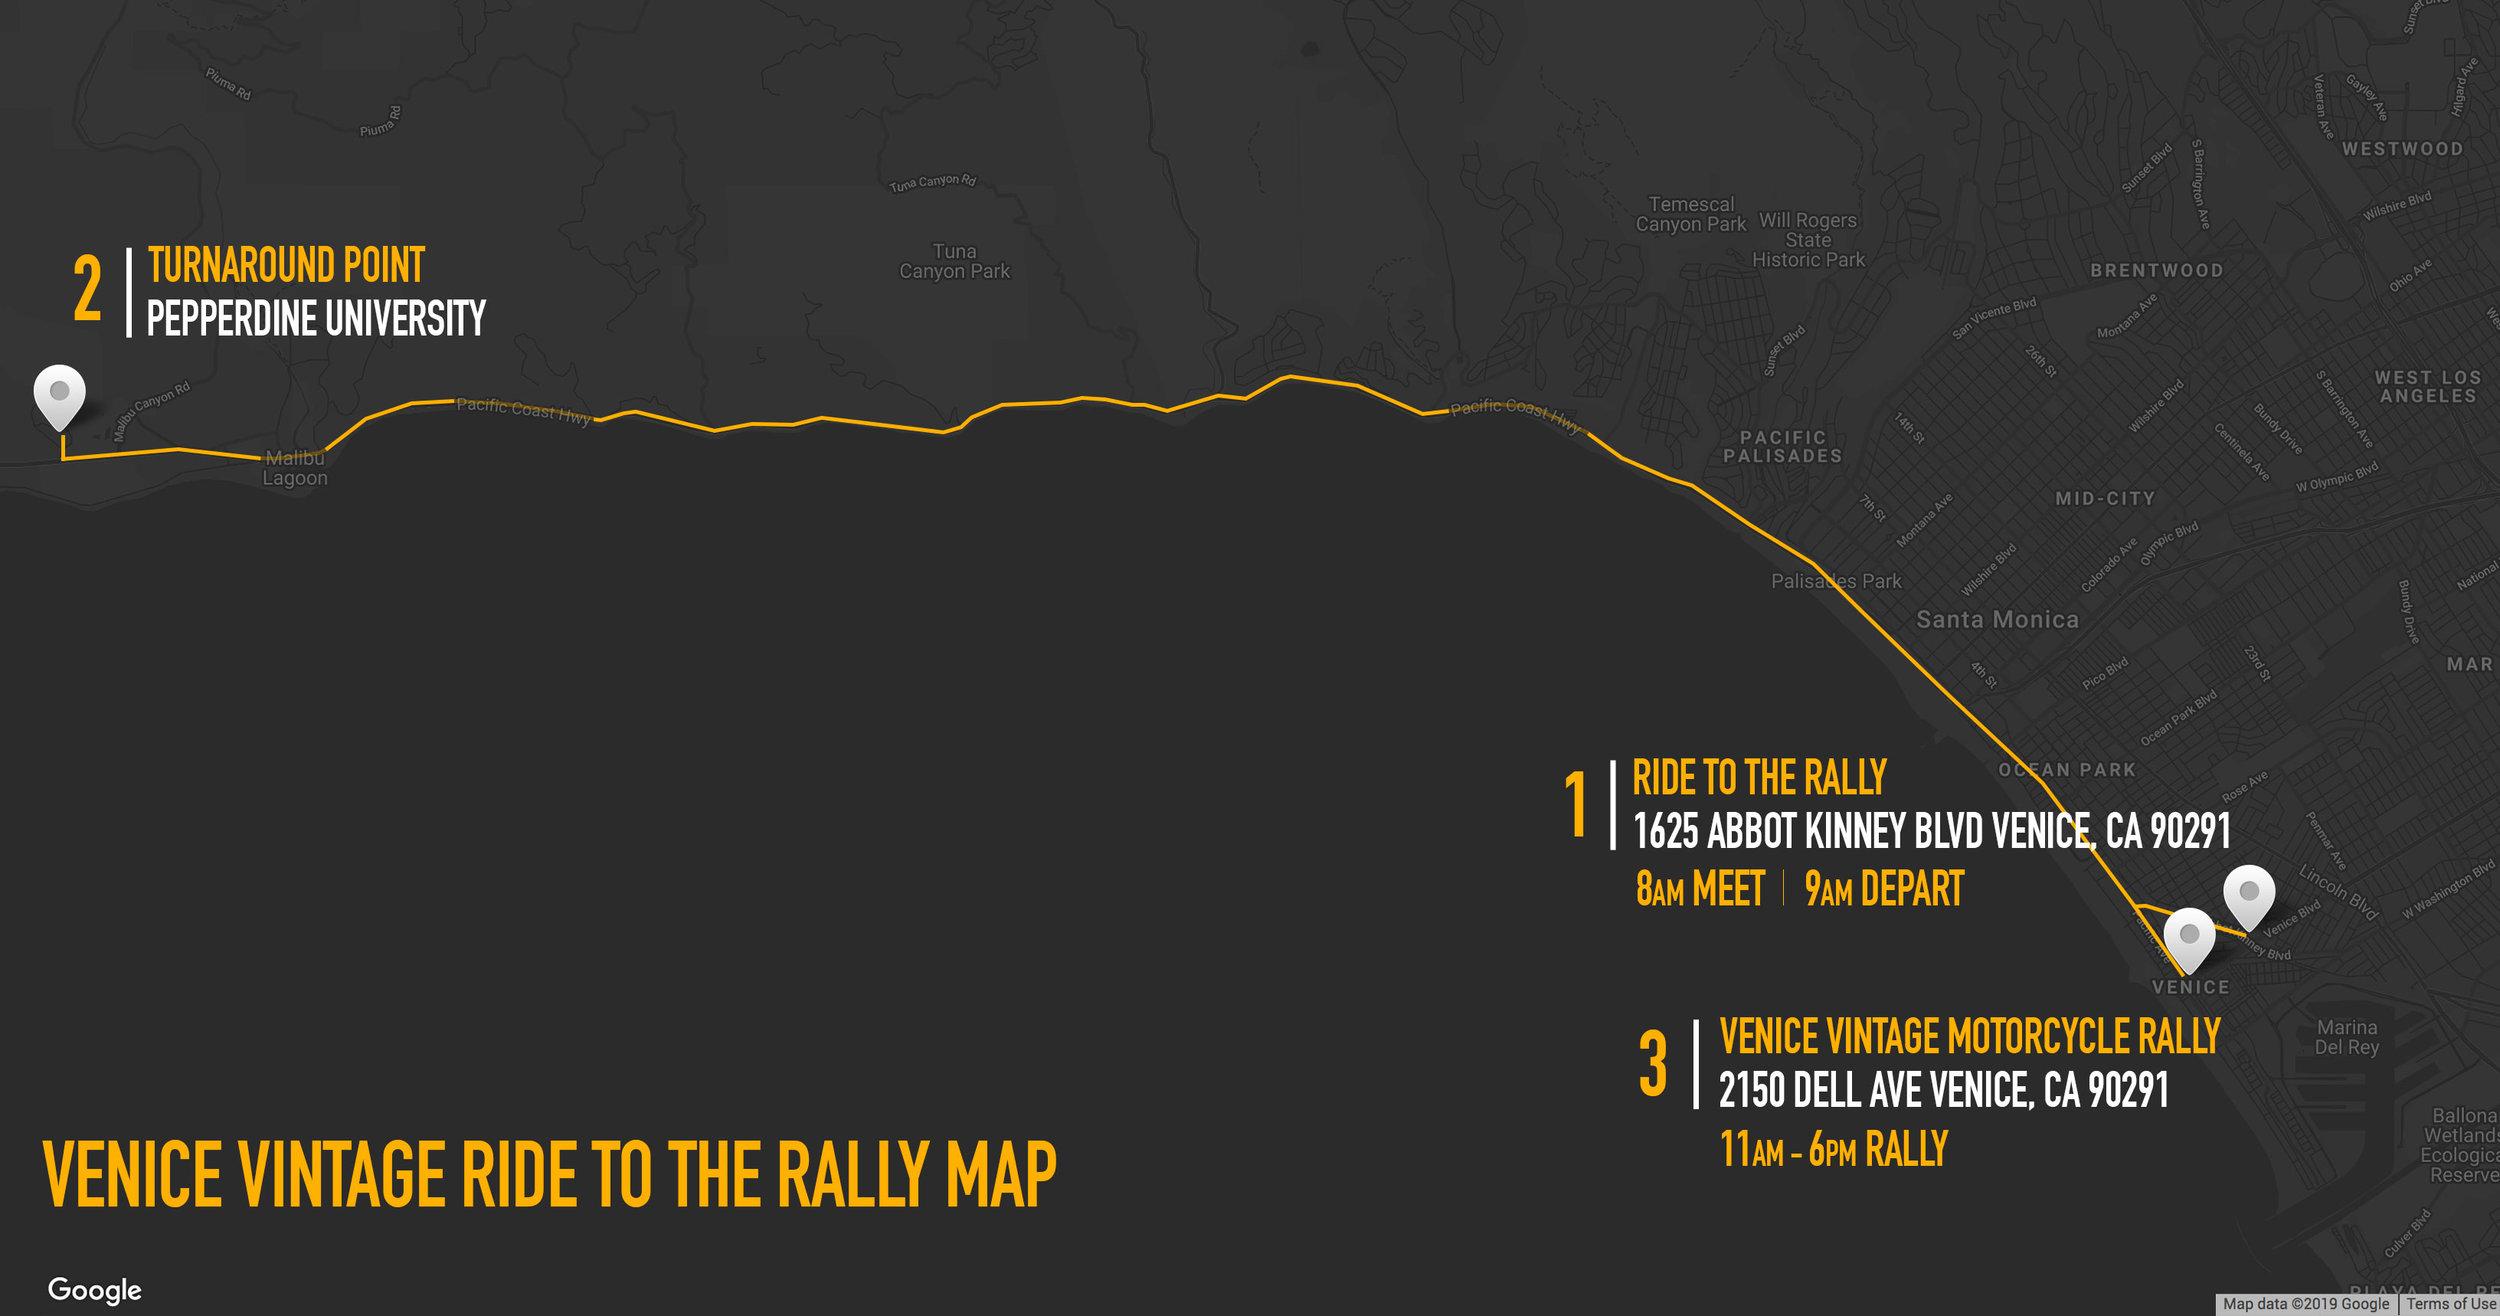 vvmr_ridetotherally_map.jpg